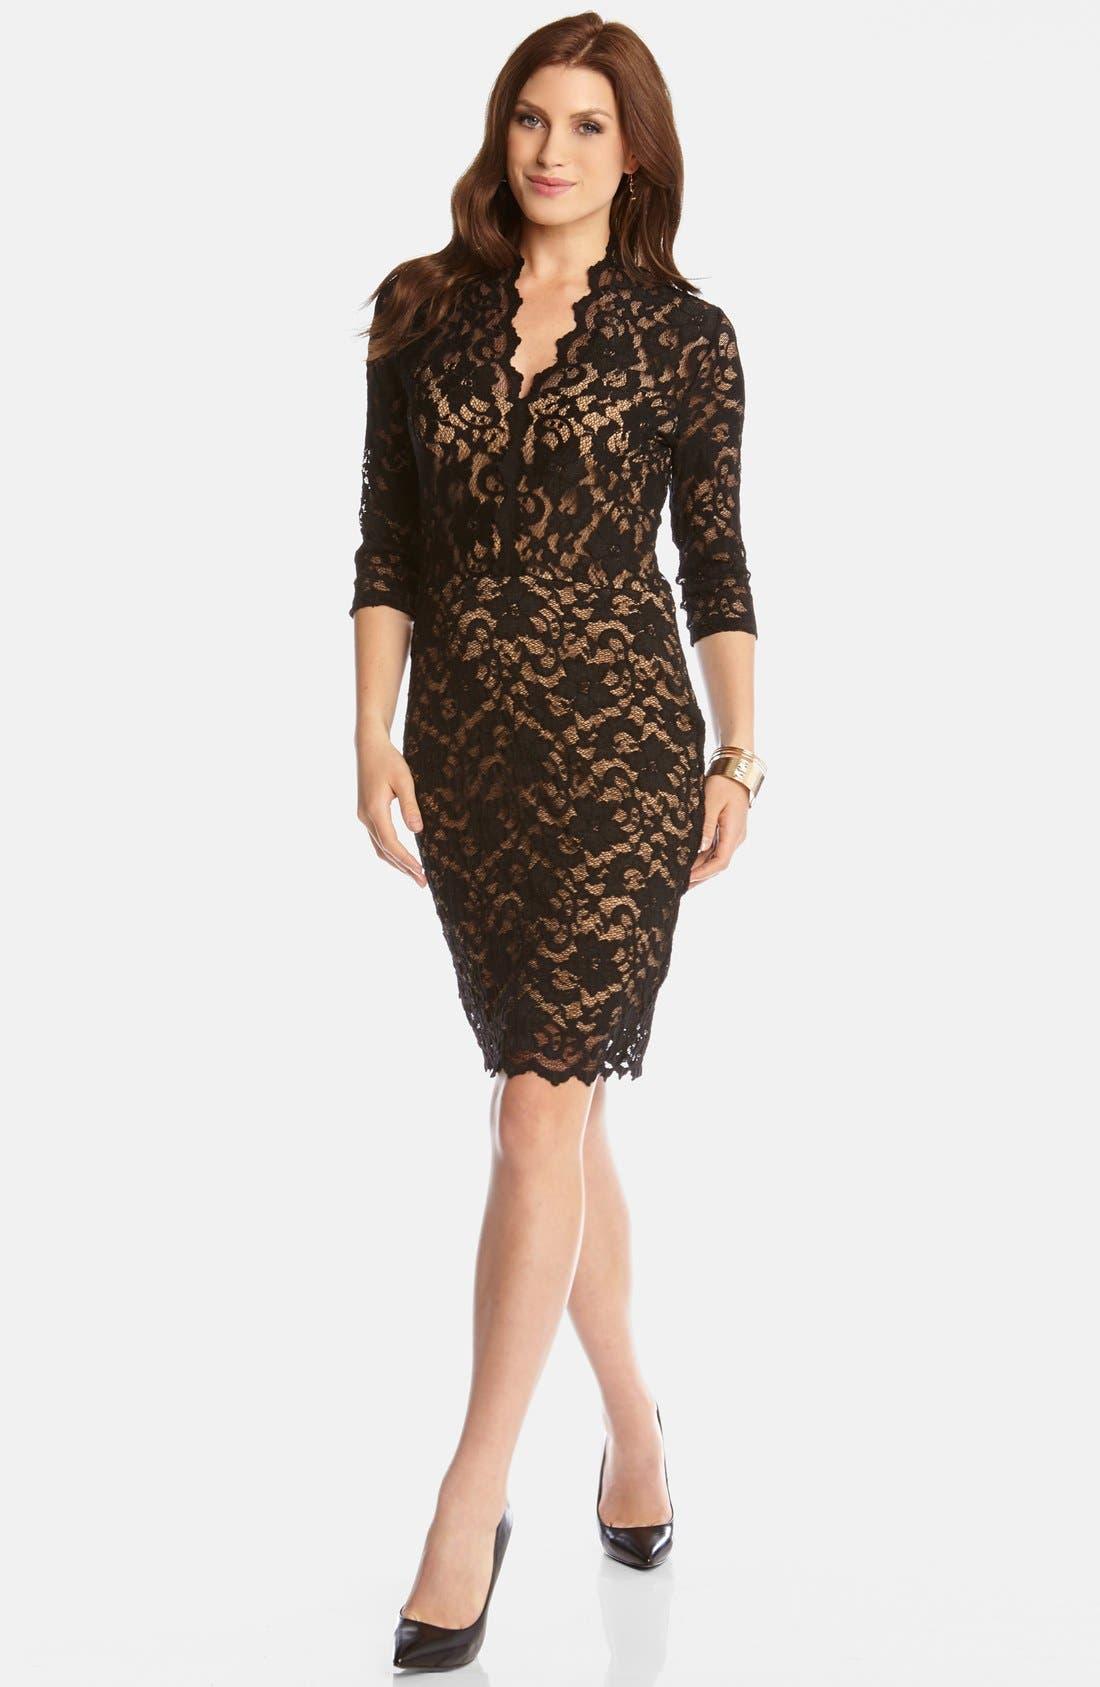 KAREN KANE Scalloped Lace Sheath Dress, Main, color, BLACK/ NUDE